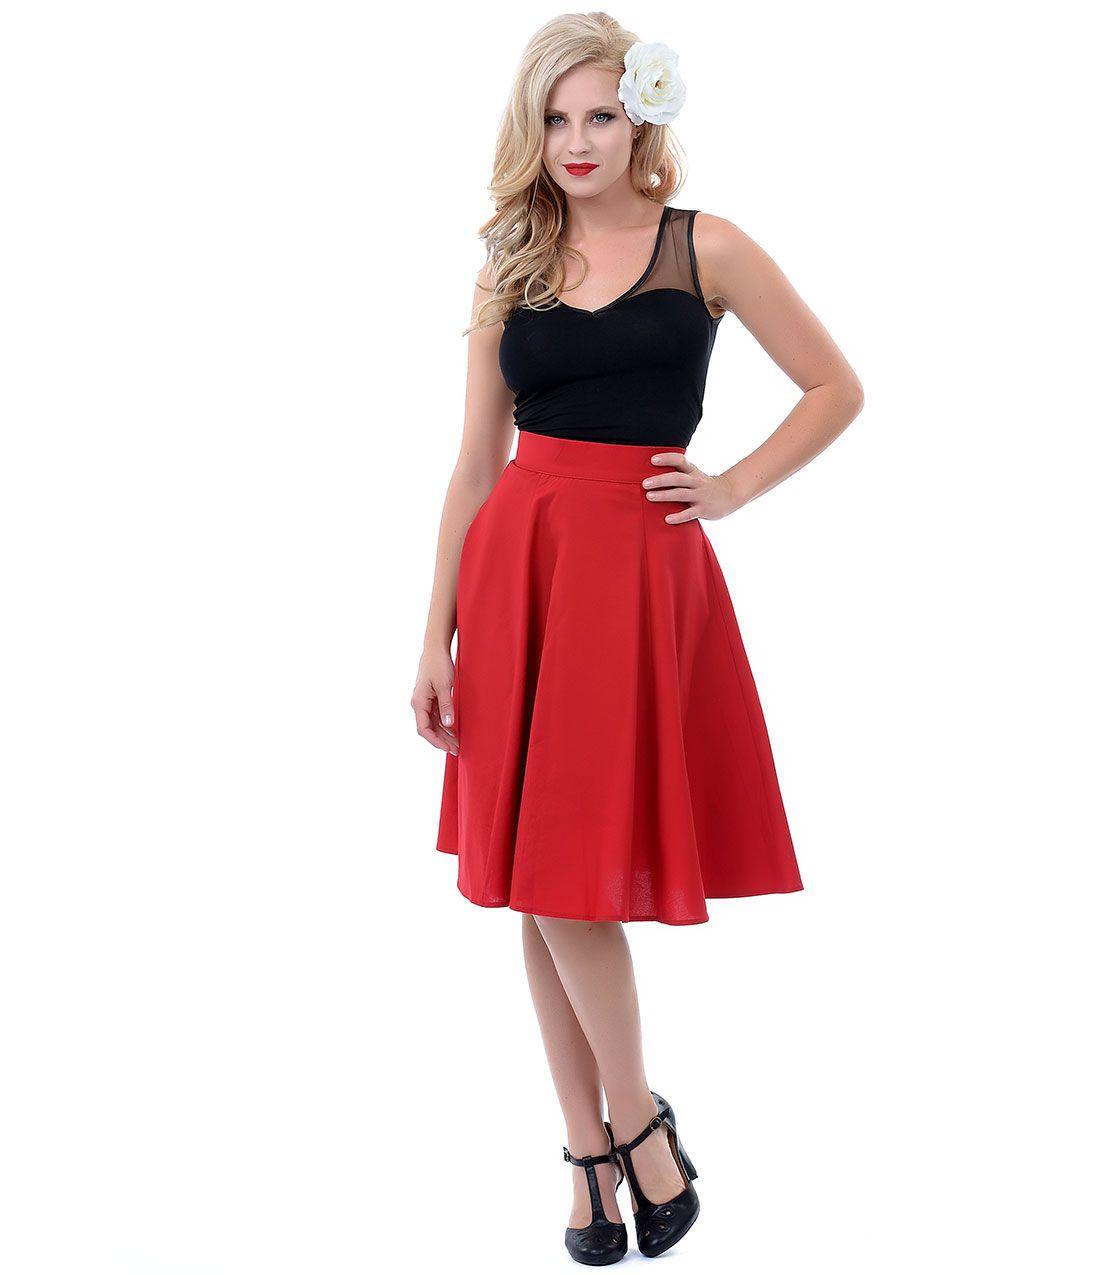 Cherry s style twirl swing skirt unique vintage prom dresses